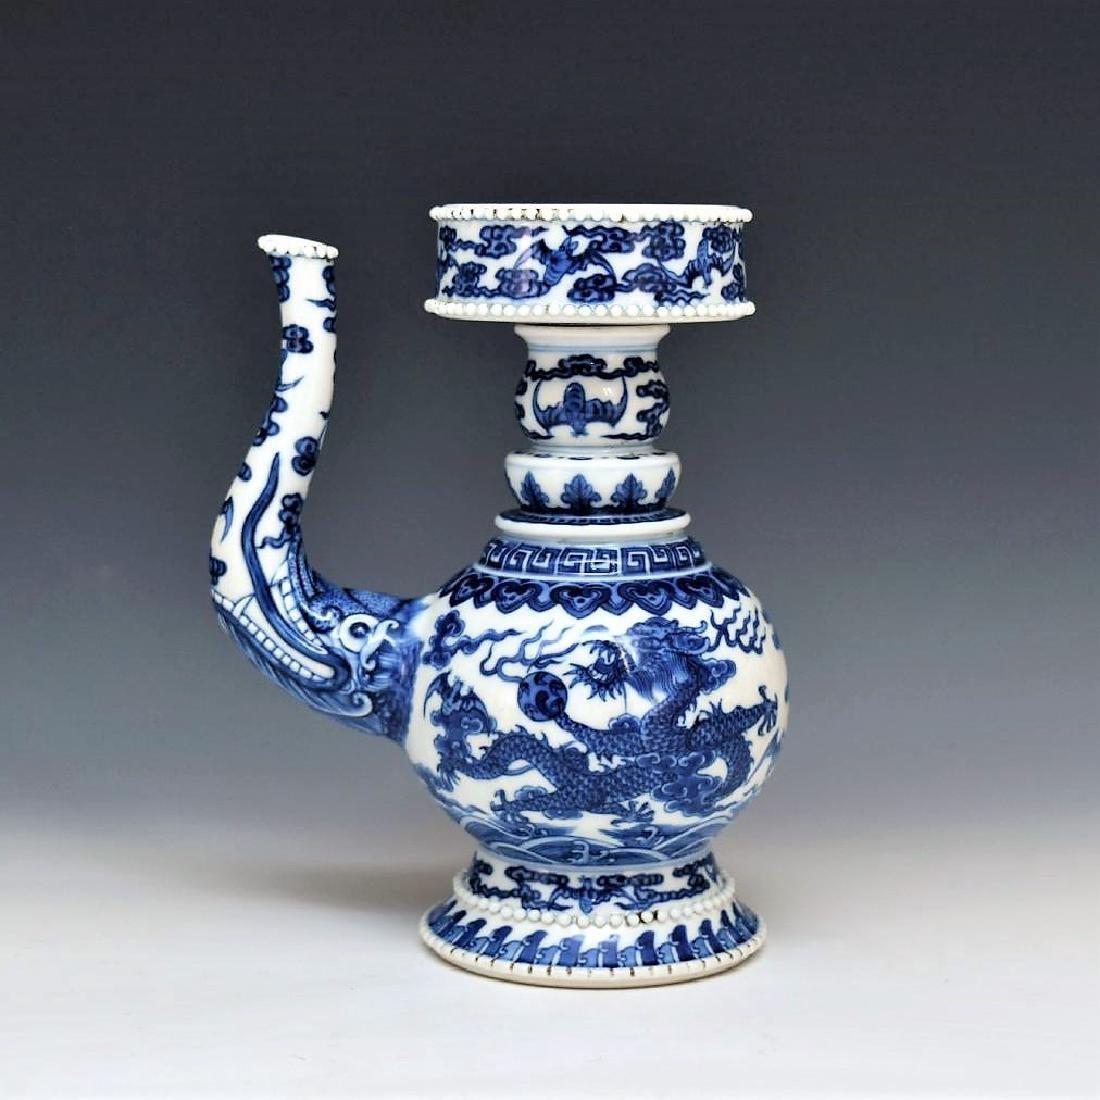 BLUE & WHITE DRAGON TEAPOT WITH POTRUDING GRAIN MOTIF